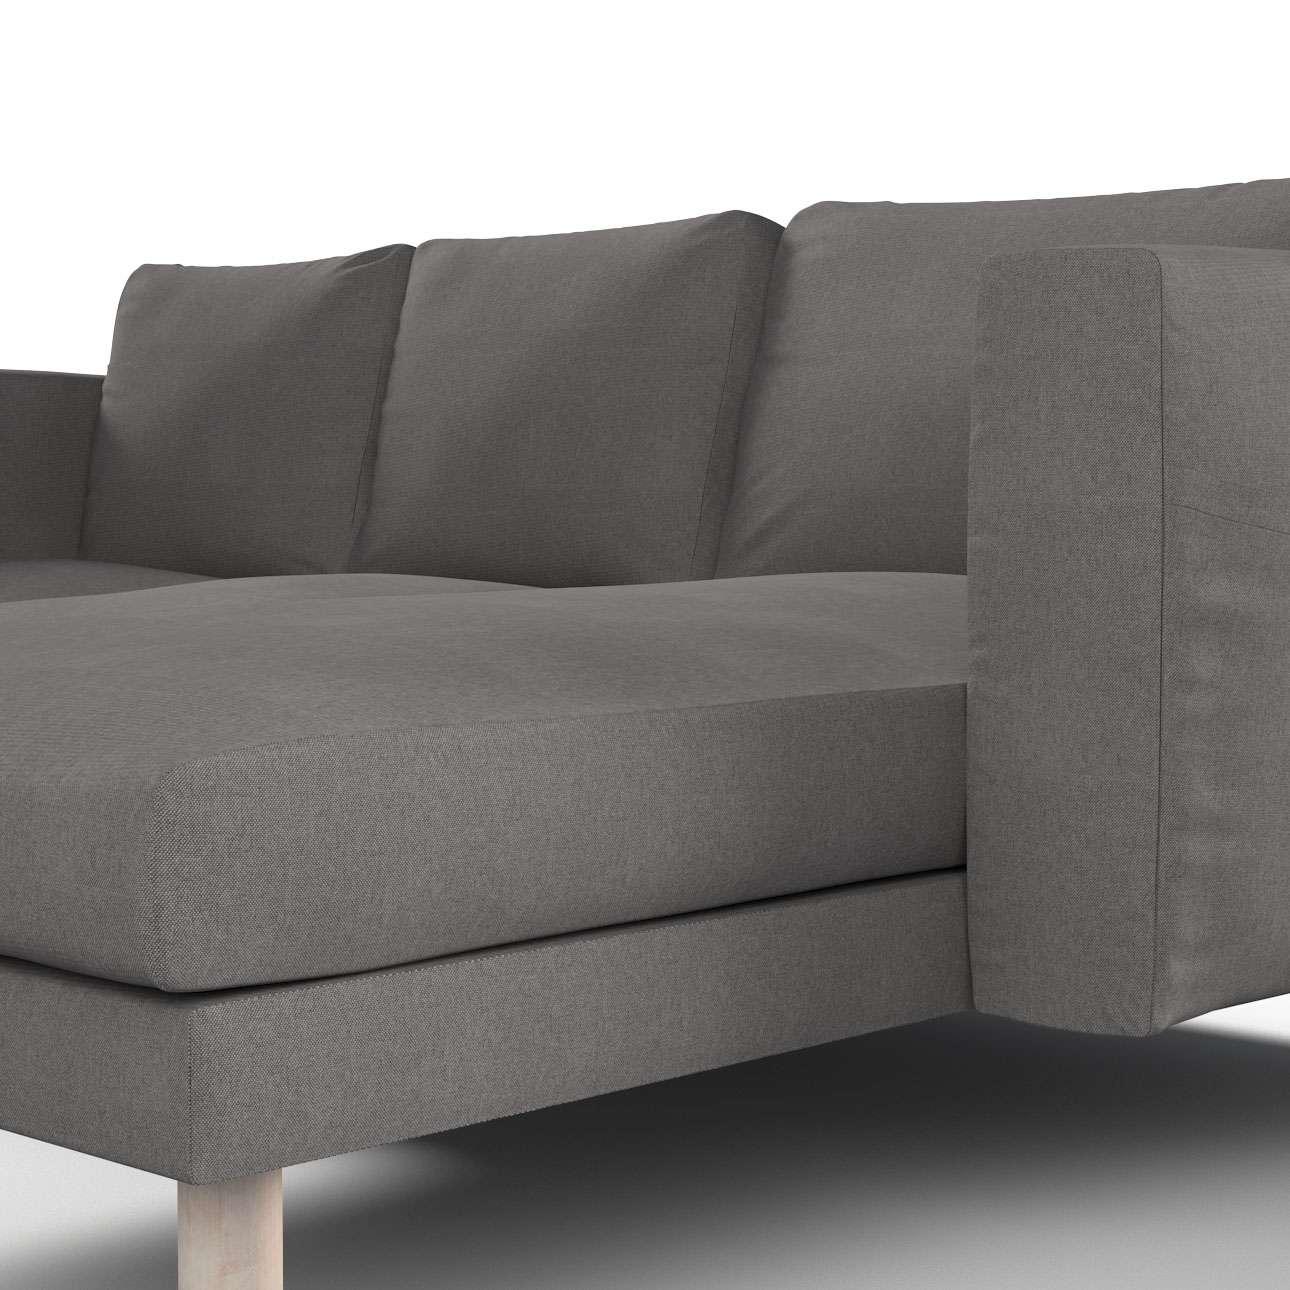 norsborg bezug f r 3 sitzer sofa mit recamiere dunkelgrau. Black Bedroom Furniture Sets. Home Design Ideas